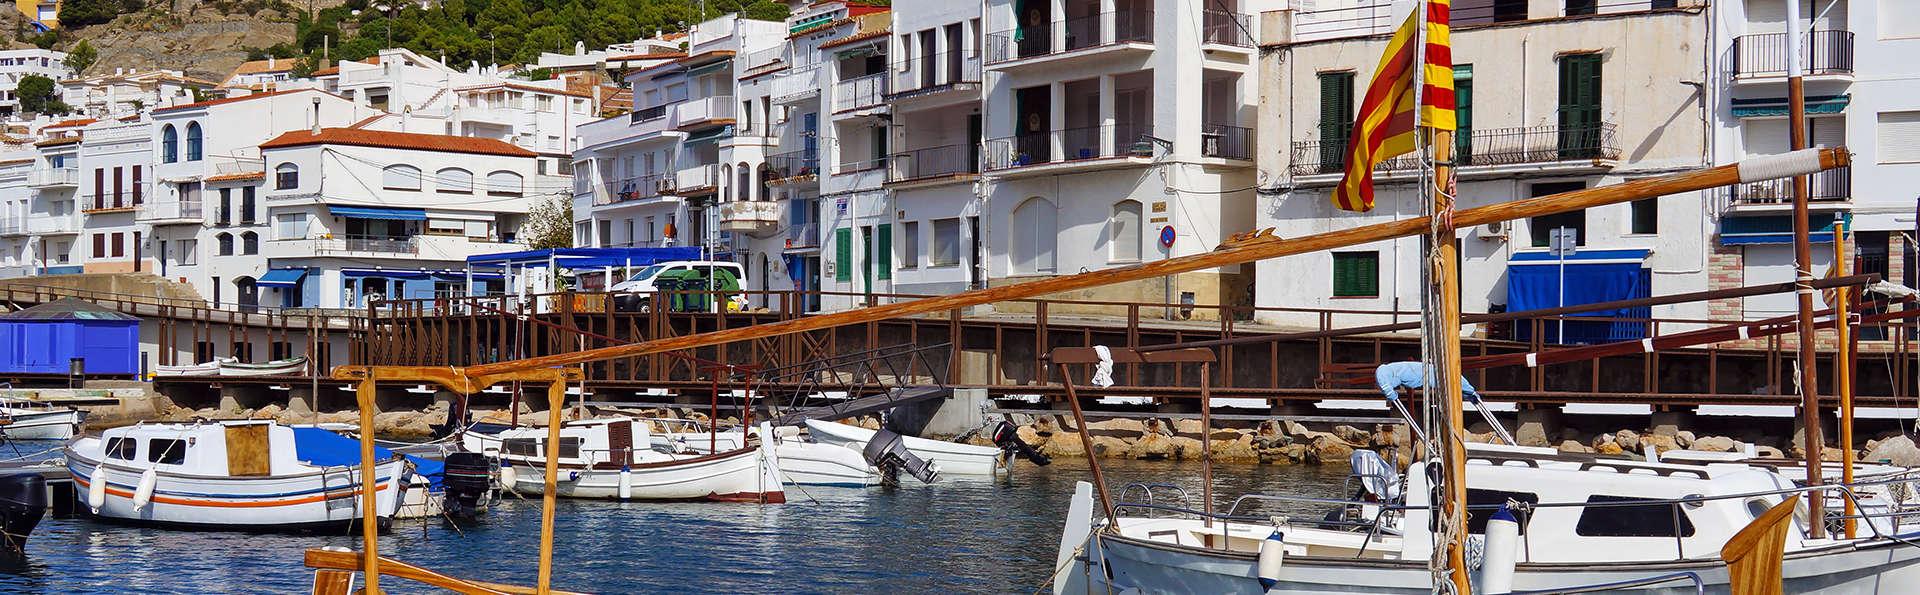 Hotel Spa Porto Cristo - Edit_PortDeLaSelva.jpg